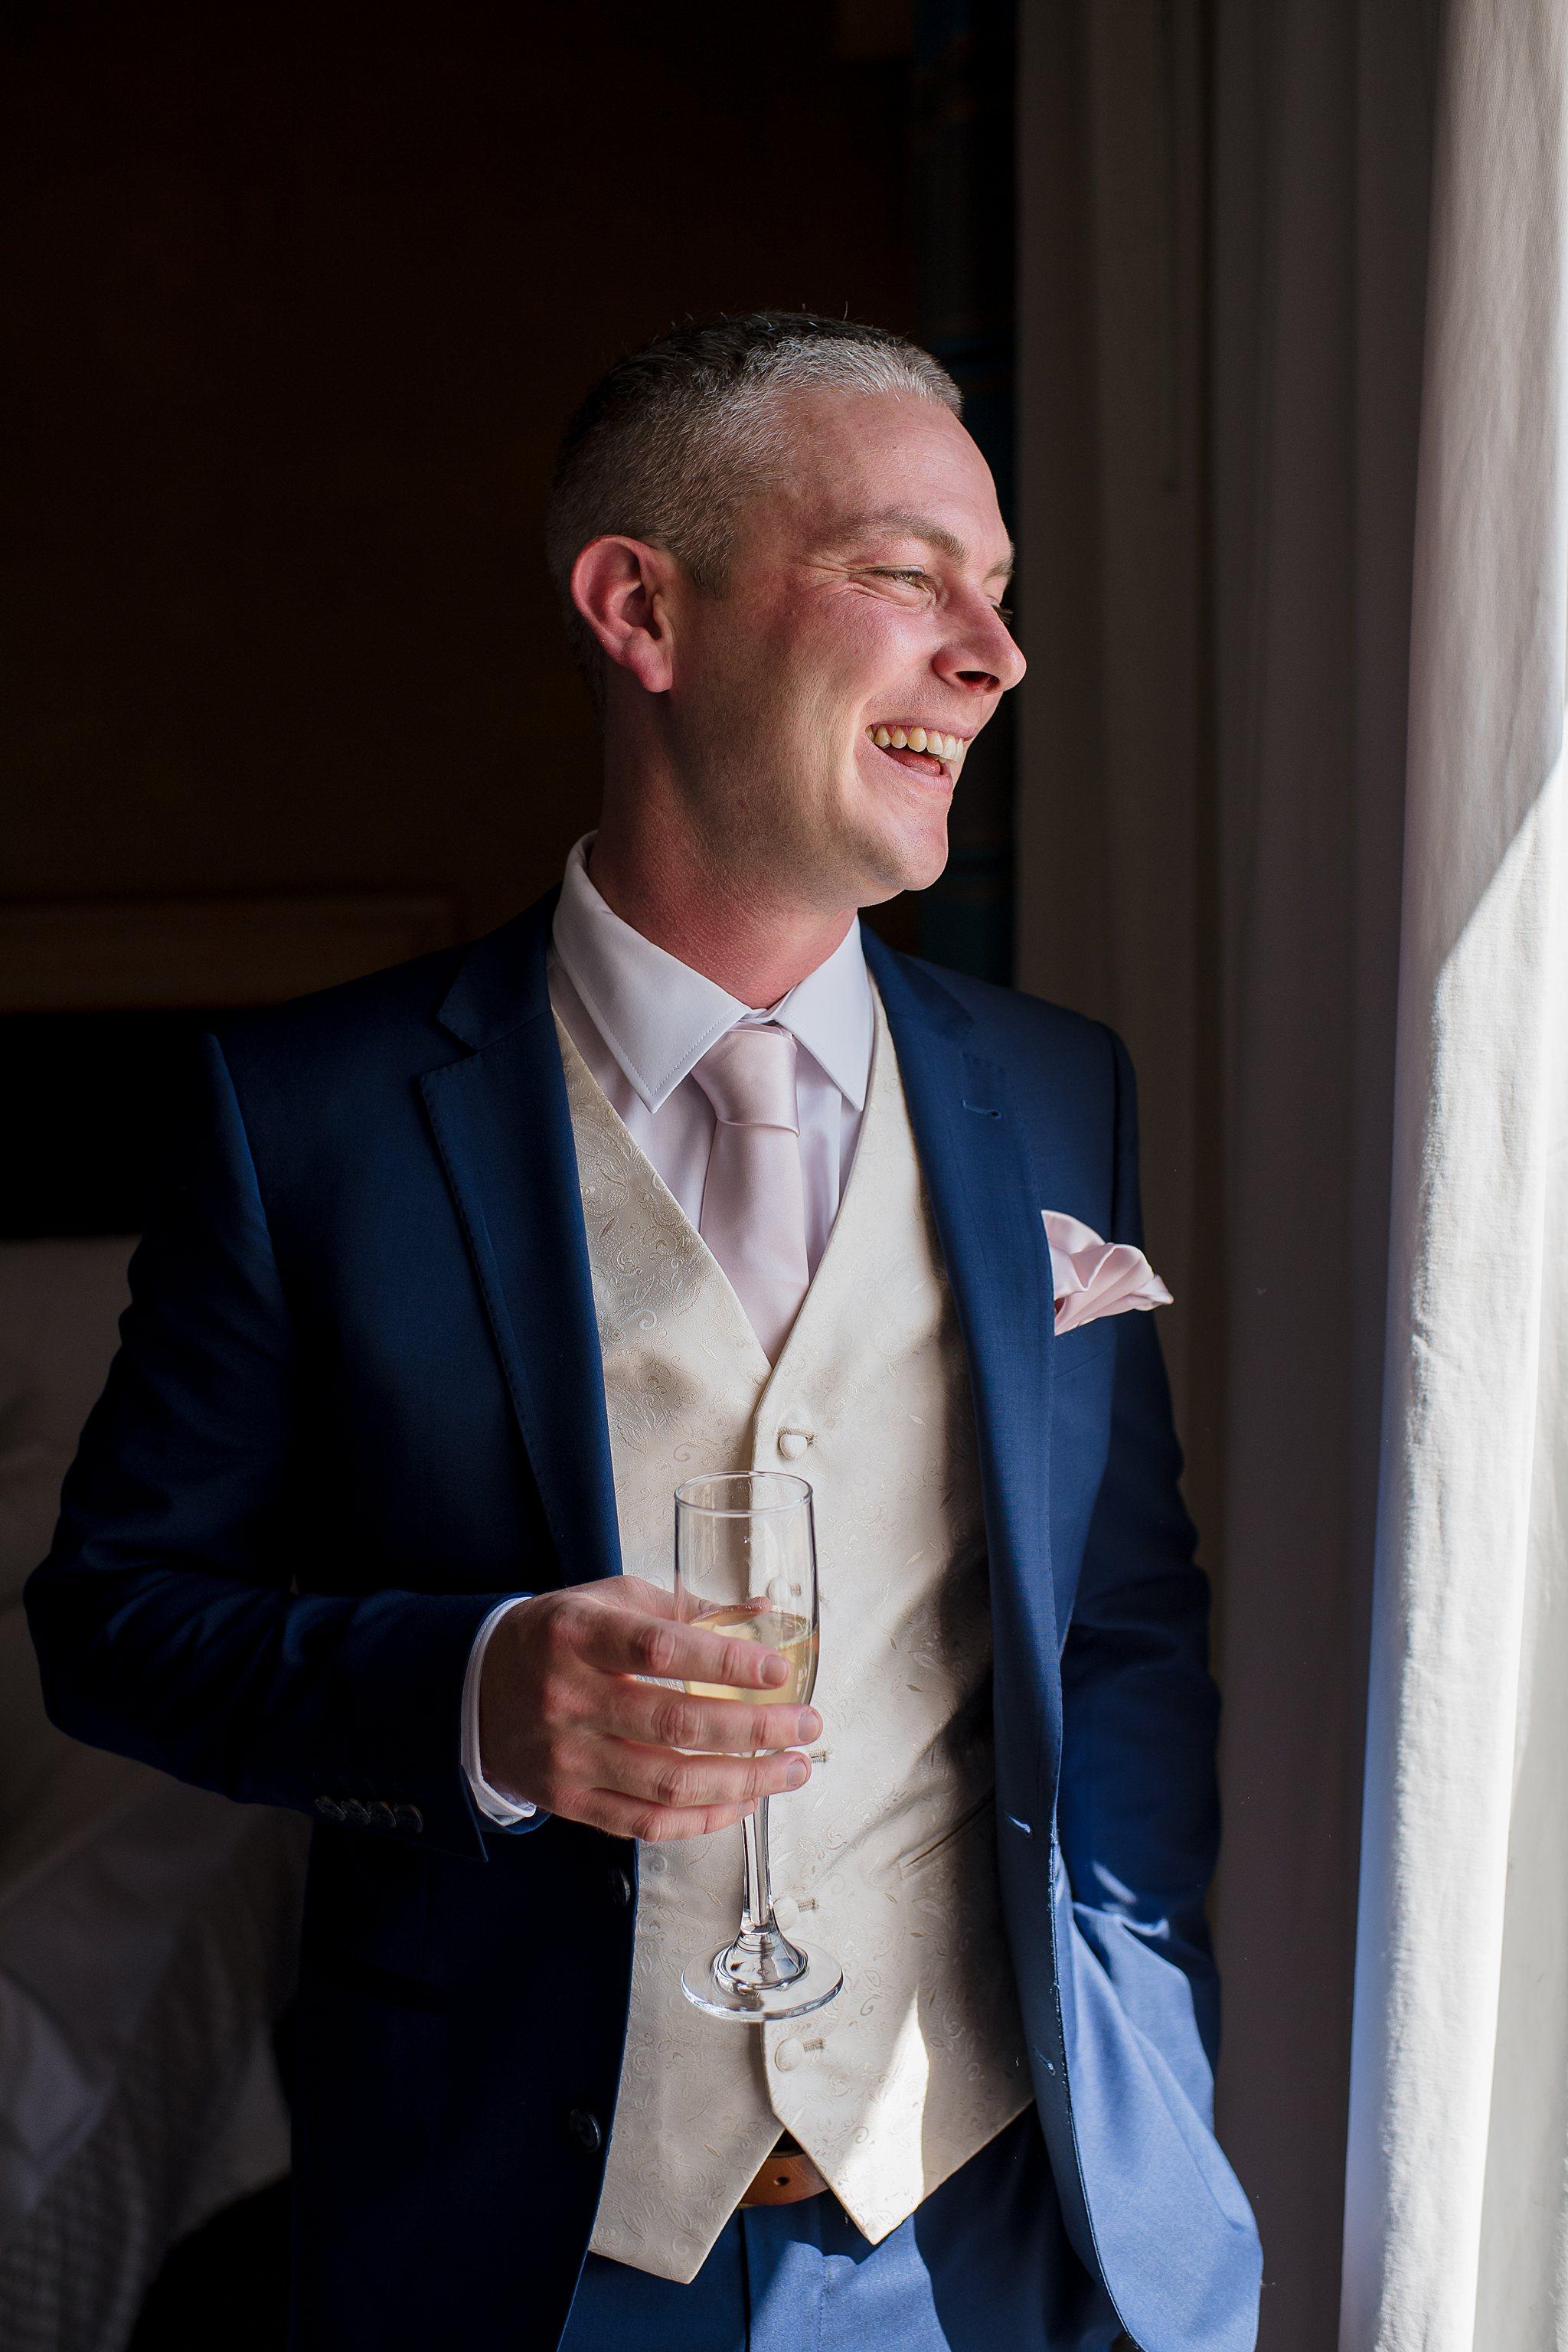 Linda & Eddie | Villa Arrigo, Naxxar | Wedding Photographer Malta, Shane P. Watts